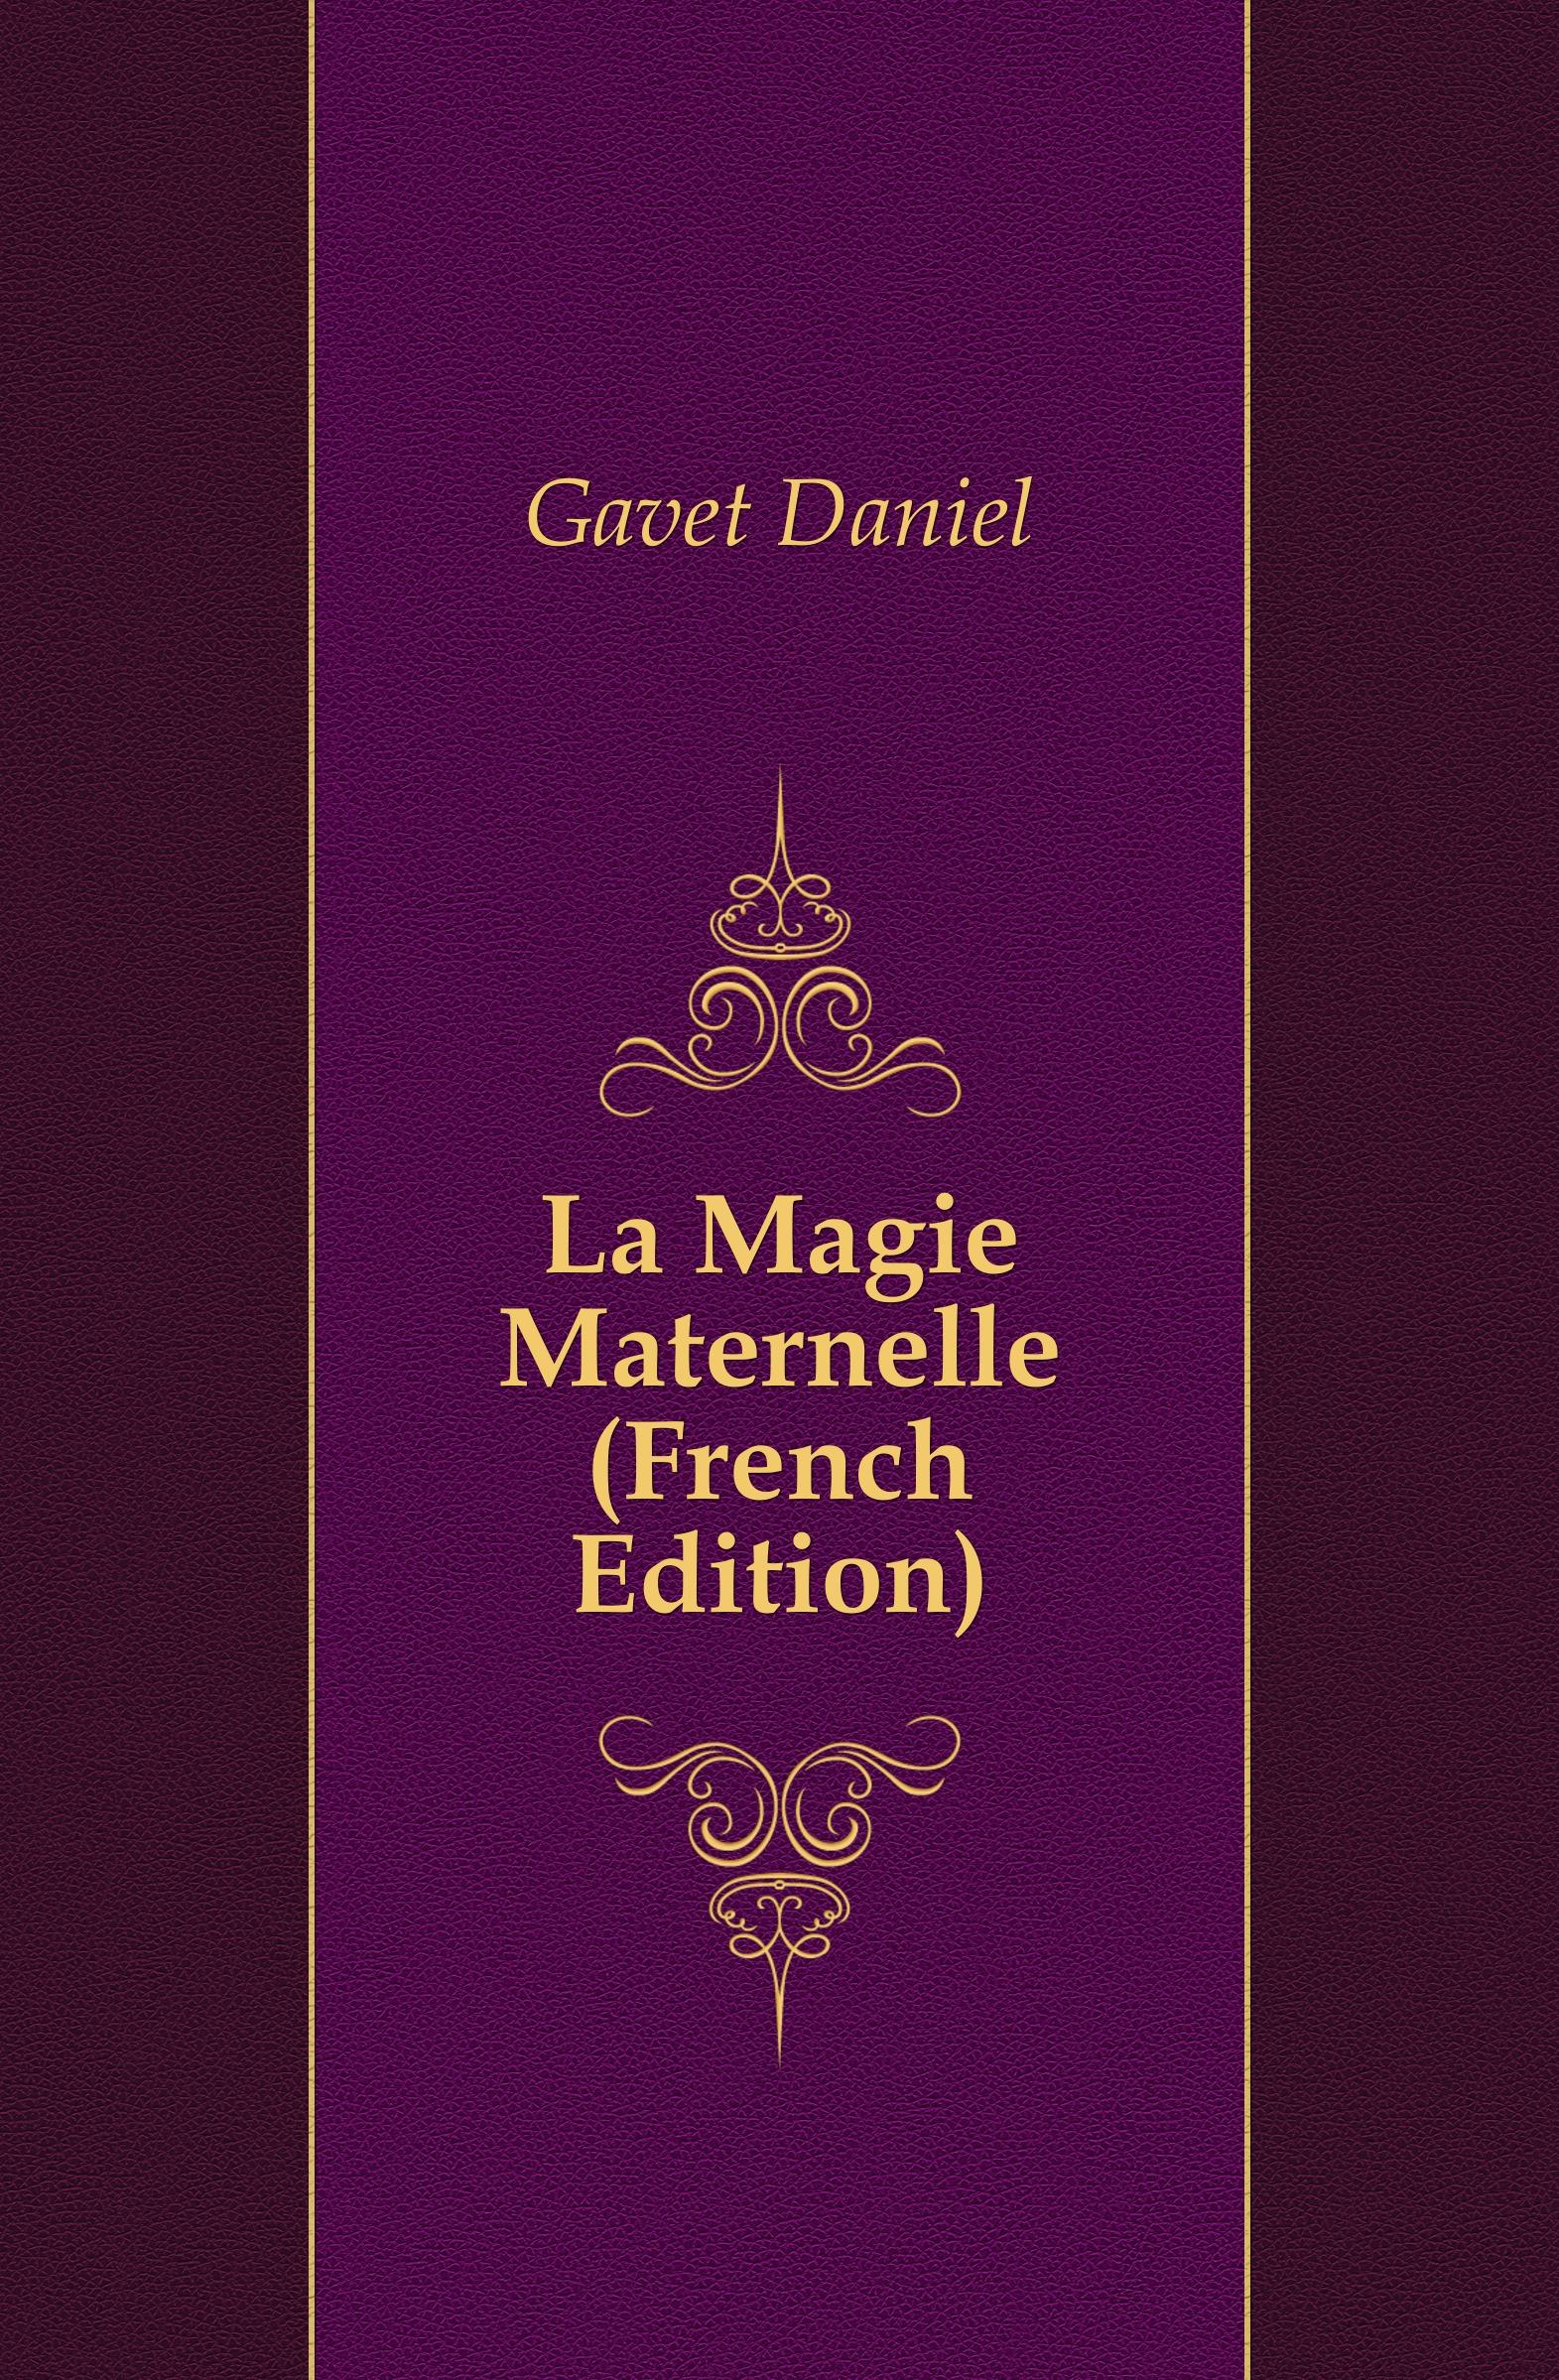 Gavet Daniel La Magie Maternelle (French Edition) la maternelle